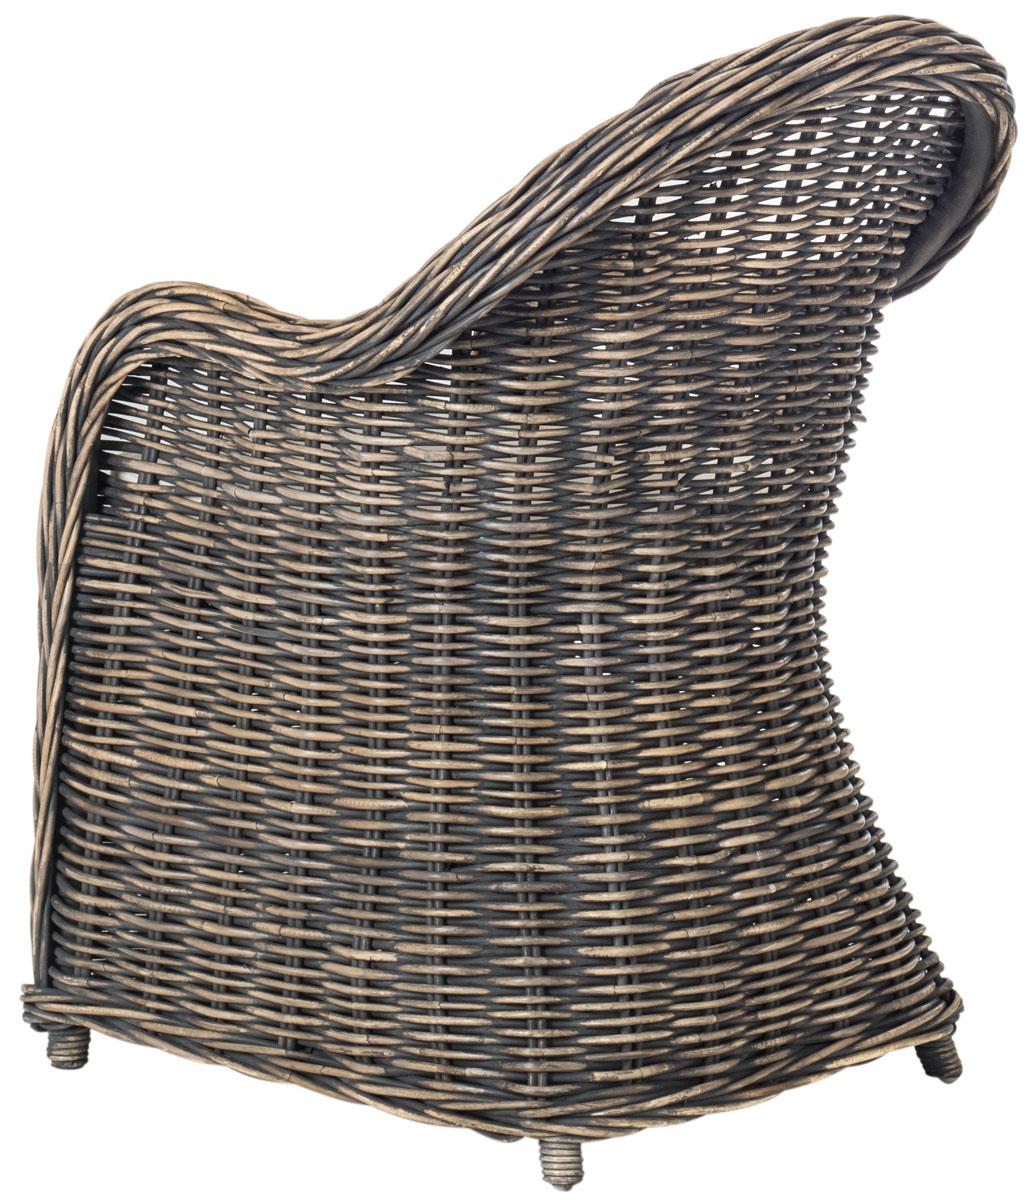 Lovely CALLISTA WICKER CLUB CHAIR SEA7001B Accent Chairs